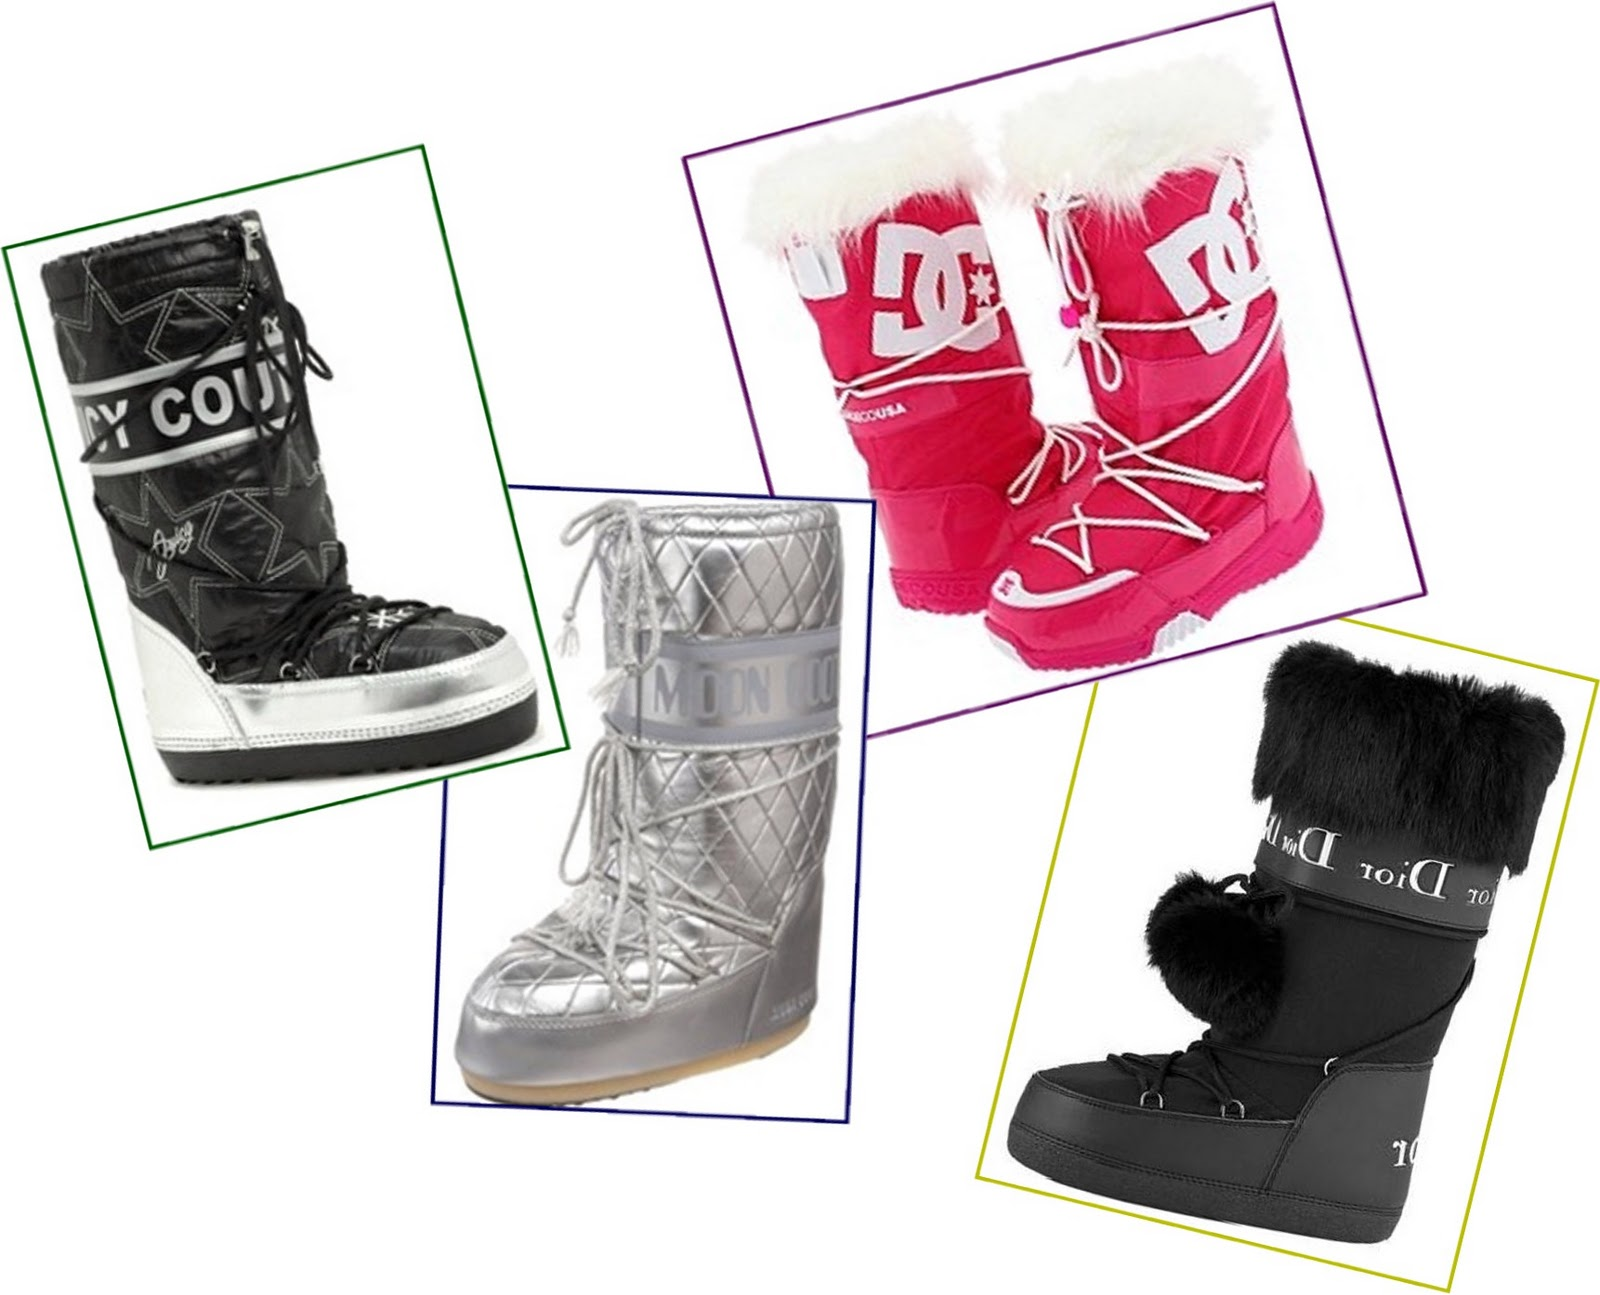 http://2.bp.blogspot.com/_DZWSQRl6Bow/TP7eTtLr6PI/AAAAAAAABls/UzULOtQhstM/s1600/snow+boots.jpg